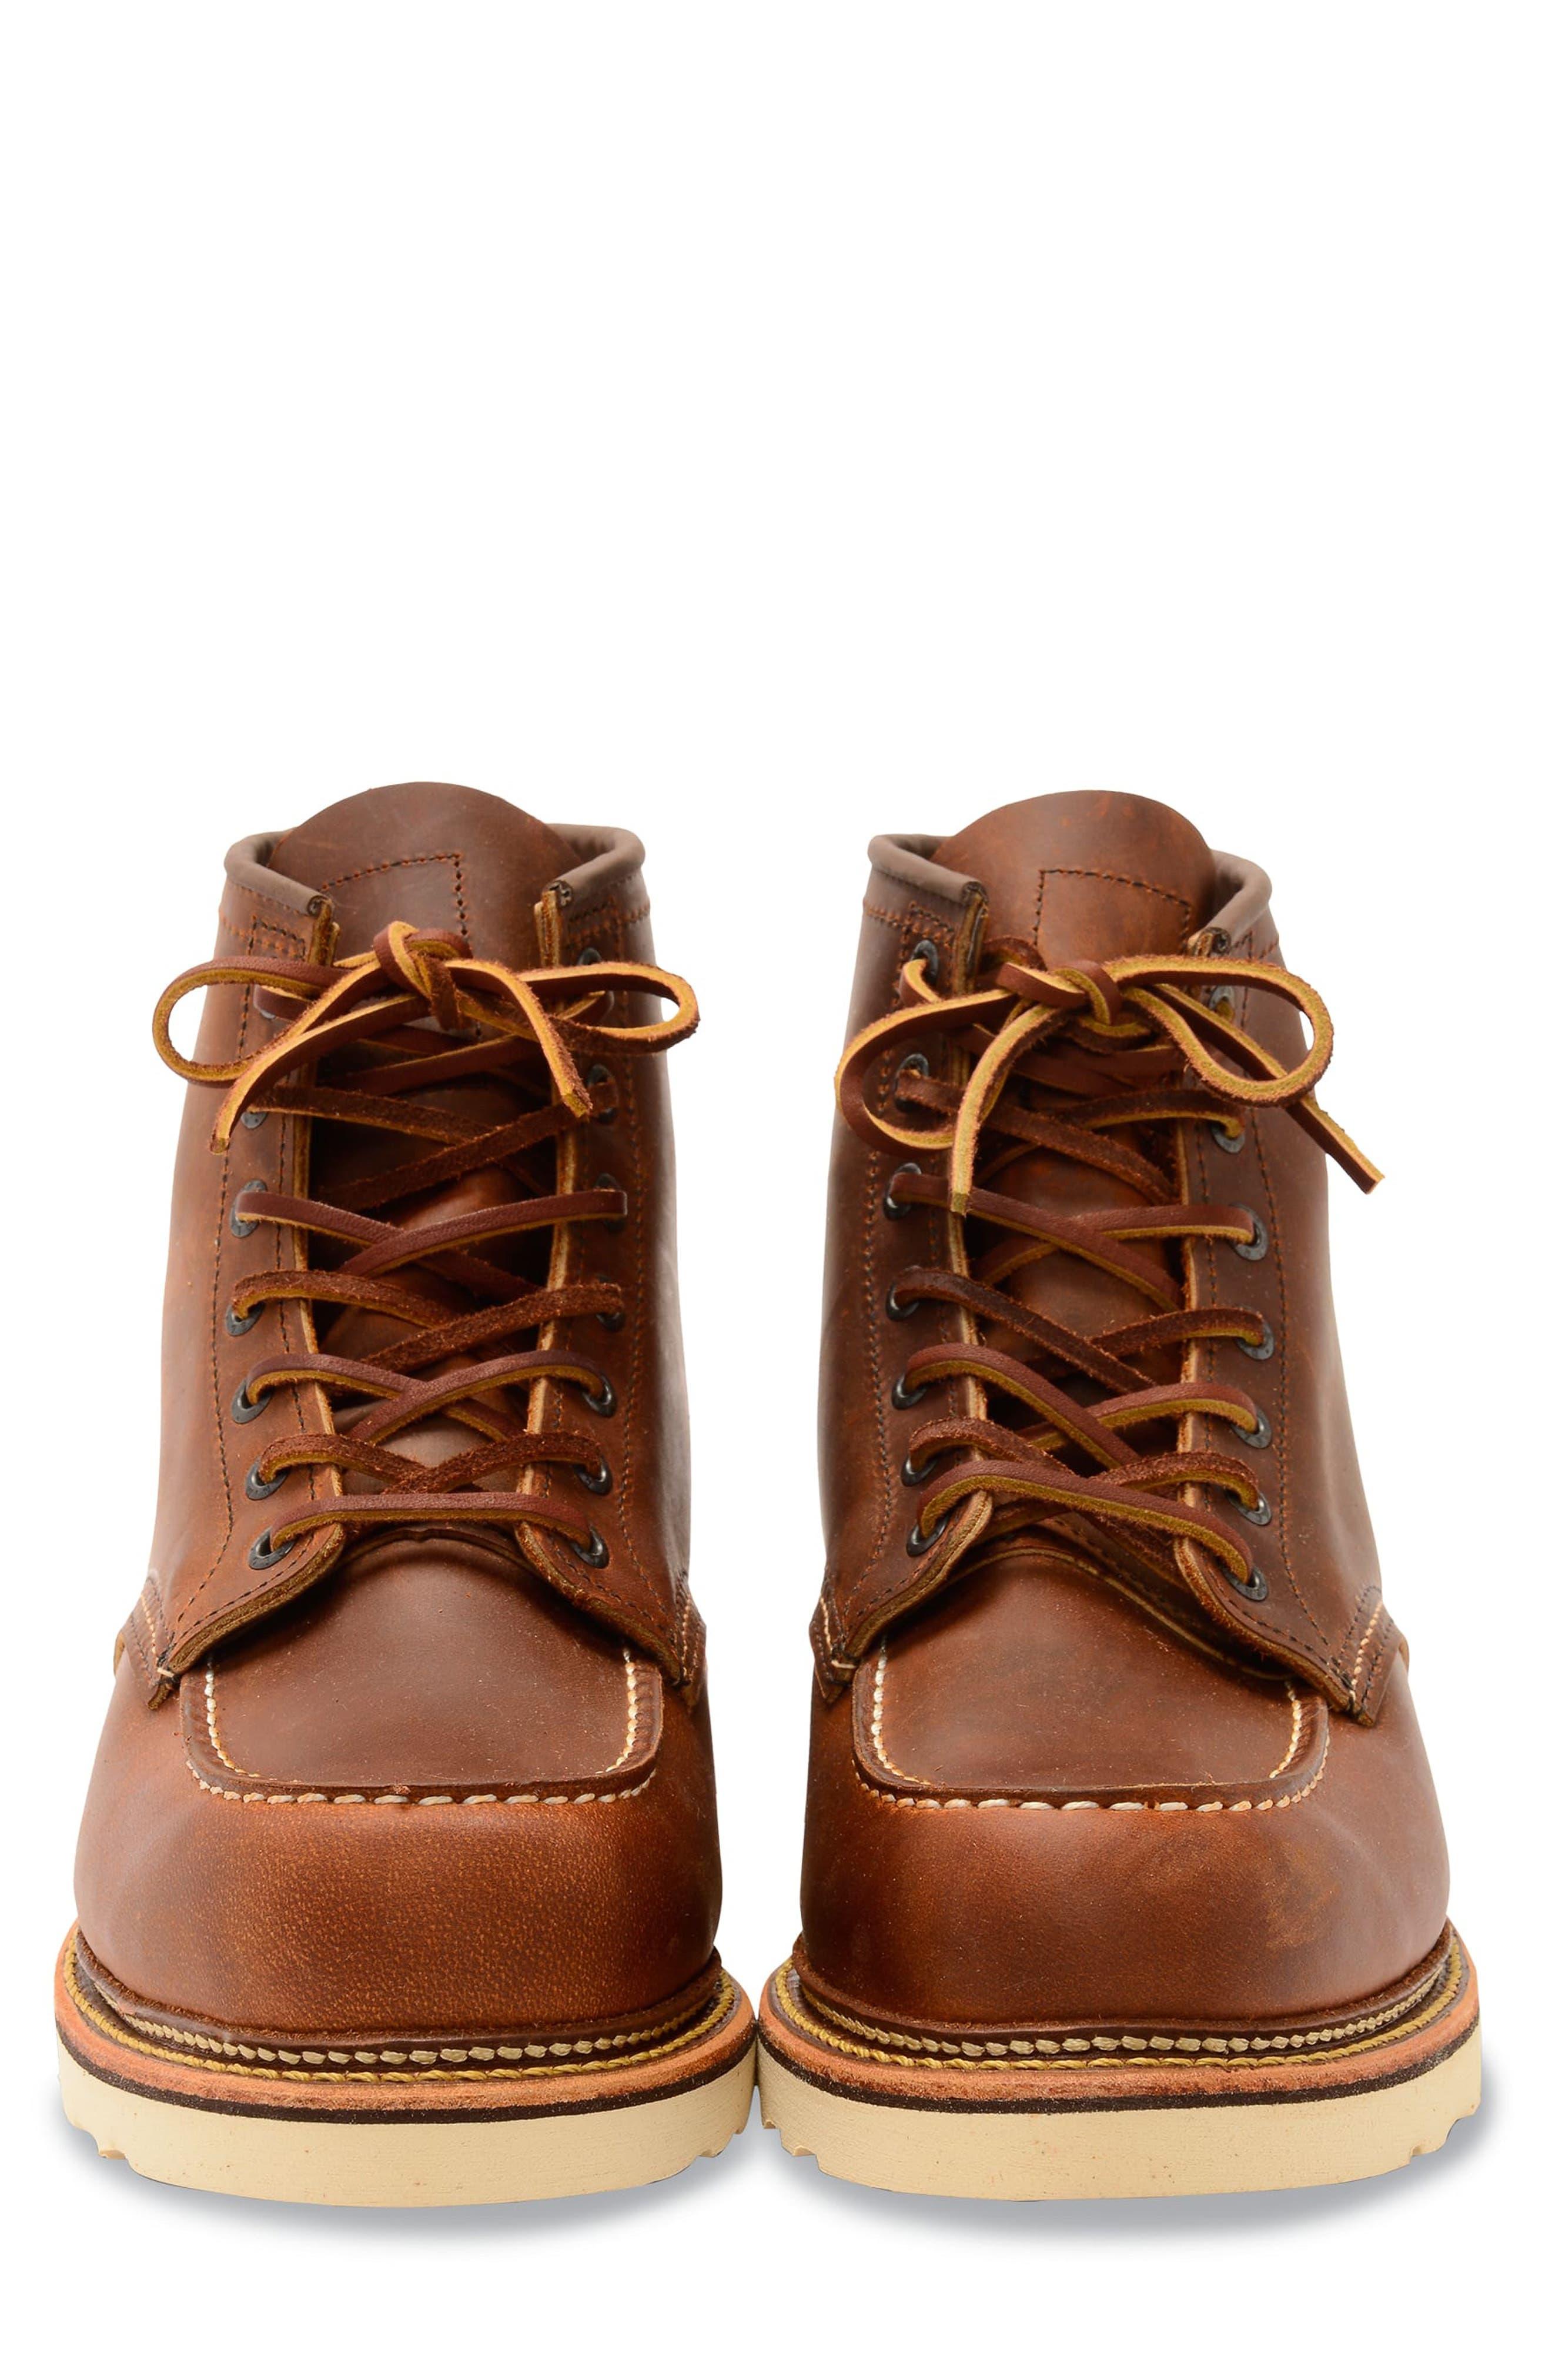 Moc Toe Boot,                             Alternate thumbnail 3, color,                             COPPER BROWN- 1907